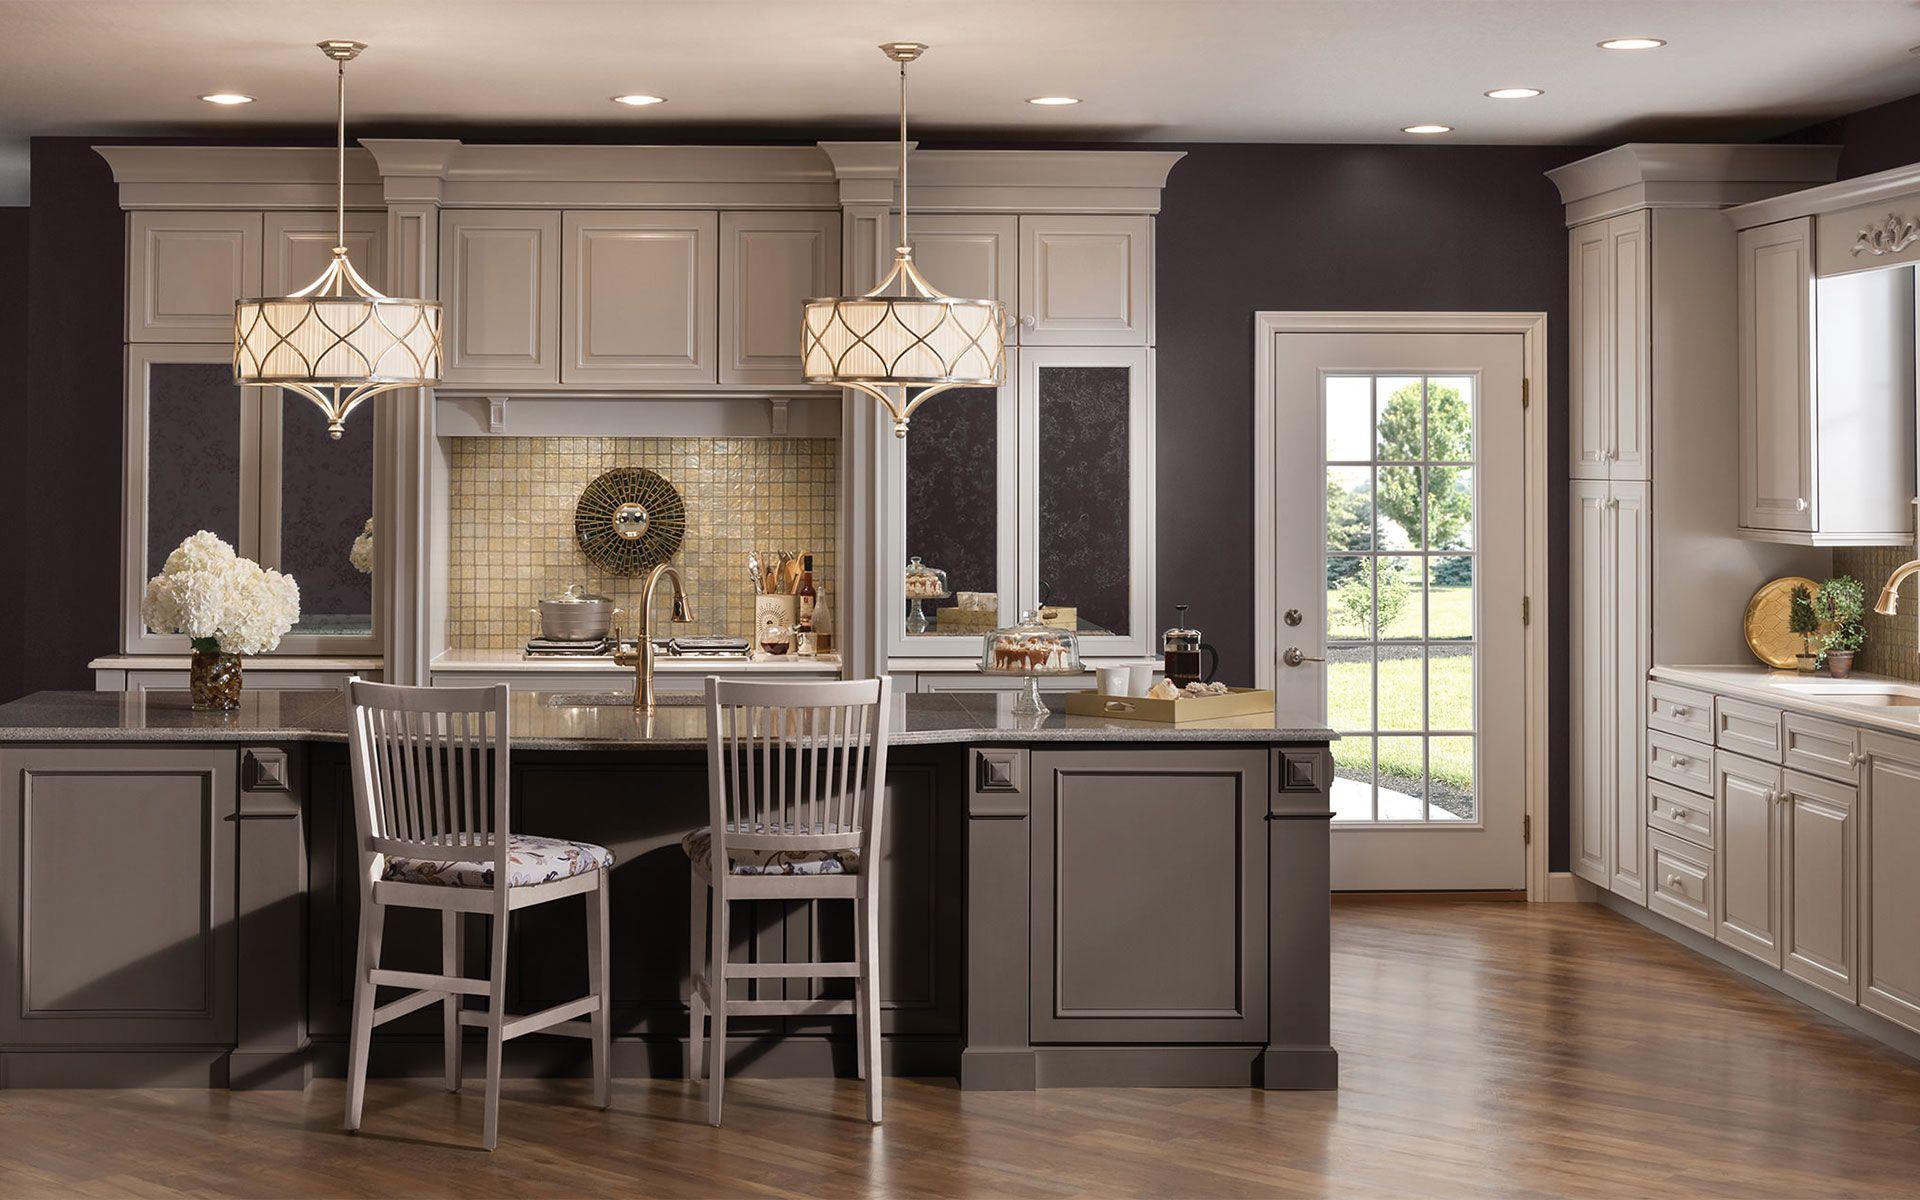 Merillat Custom Kitchen Cabinets Cowlitz County Washington Mc T Construction Merillat Cabinets Grey Kitchen Cabinets Kitchen Design Trends